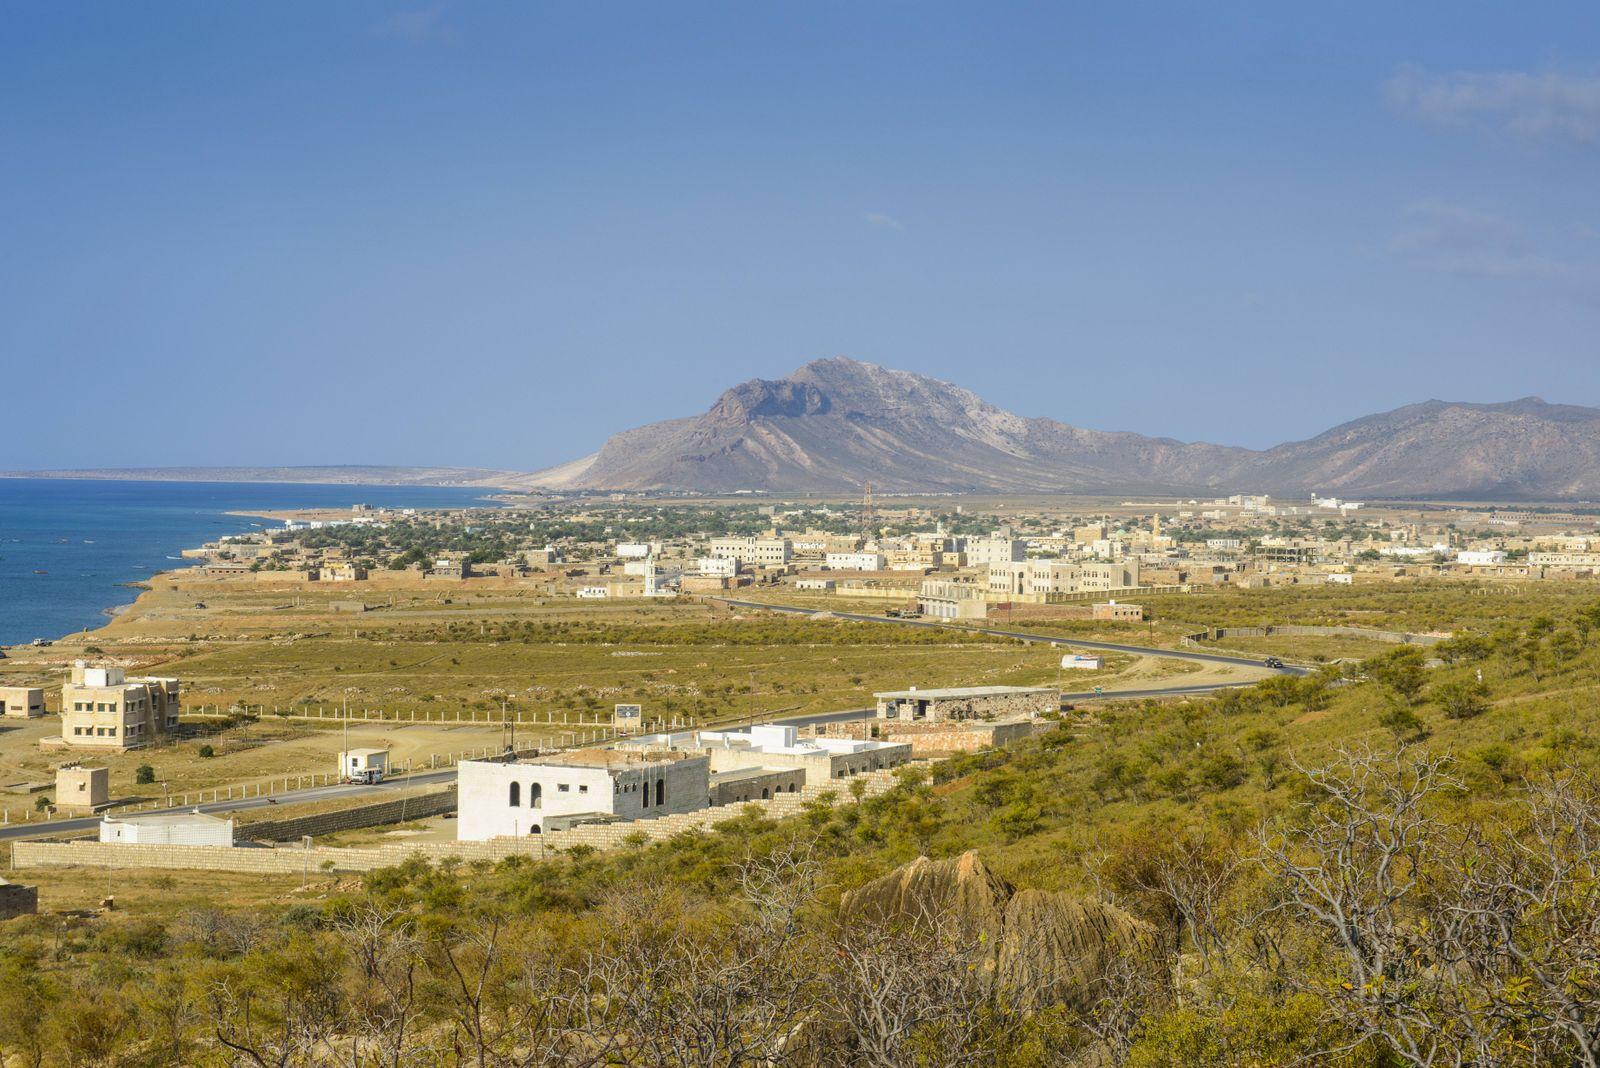 View of Hadibo capital of the island of Socotra UNESCO World Heritage Site Yemen Middle East PUB